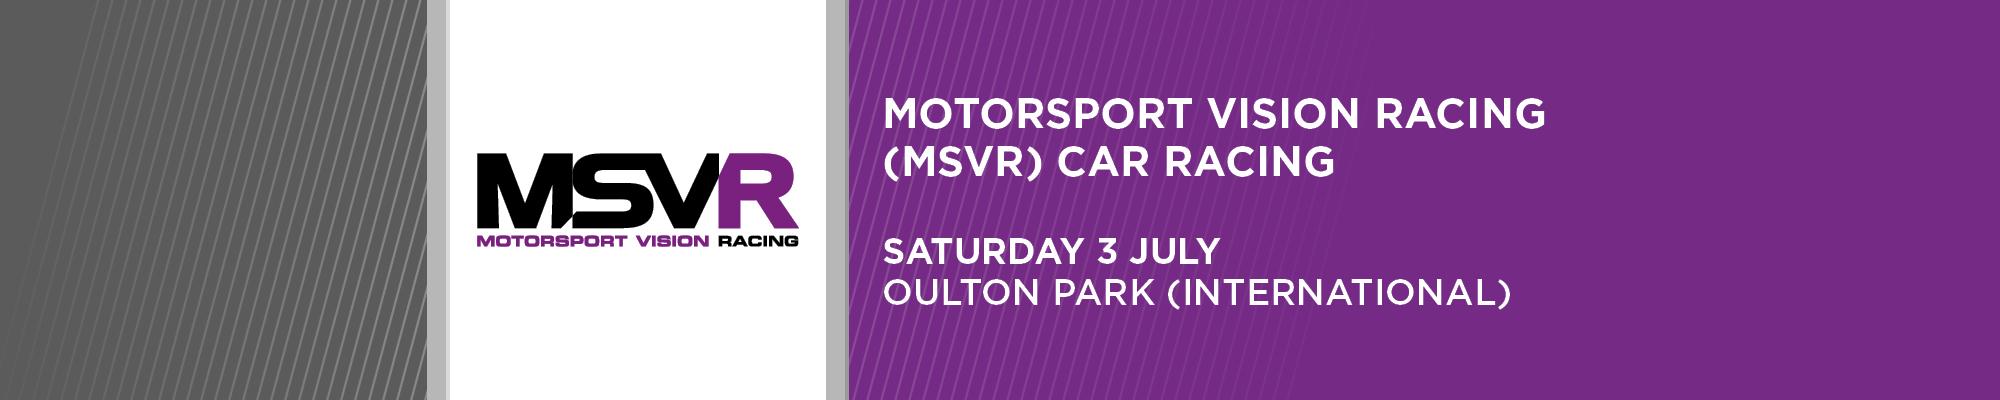 MSVR Club Car Championship